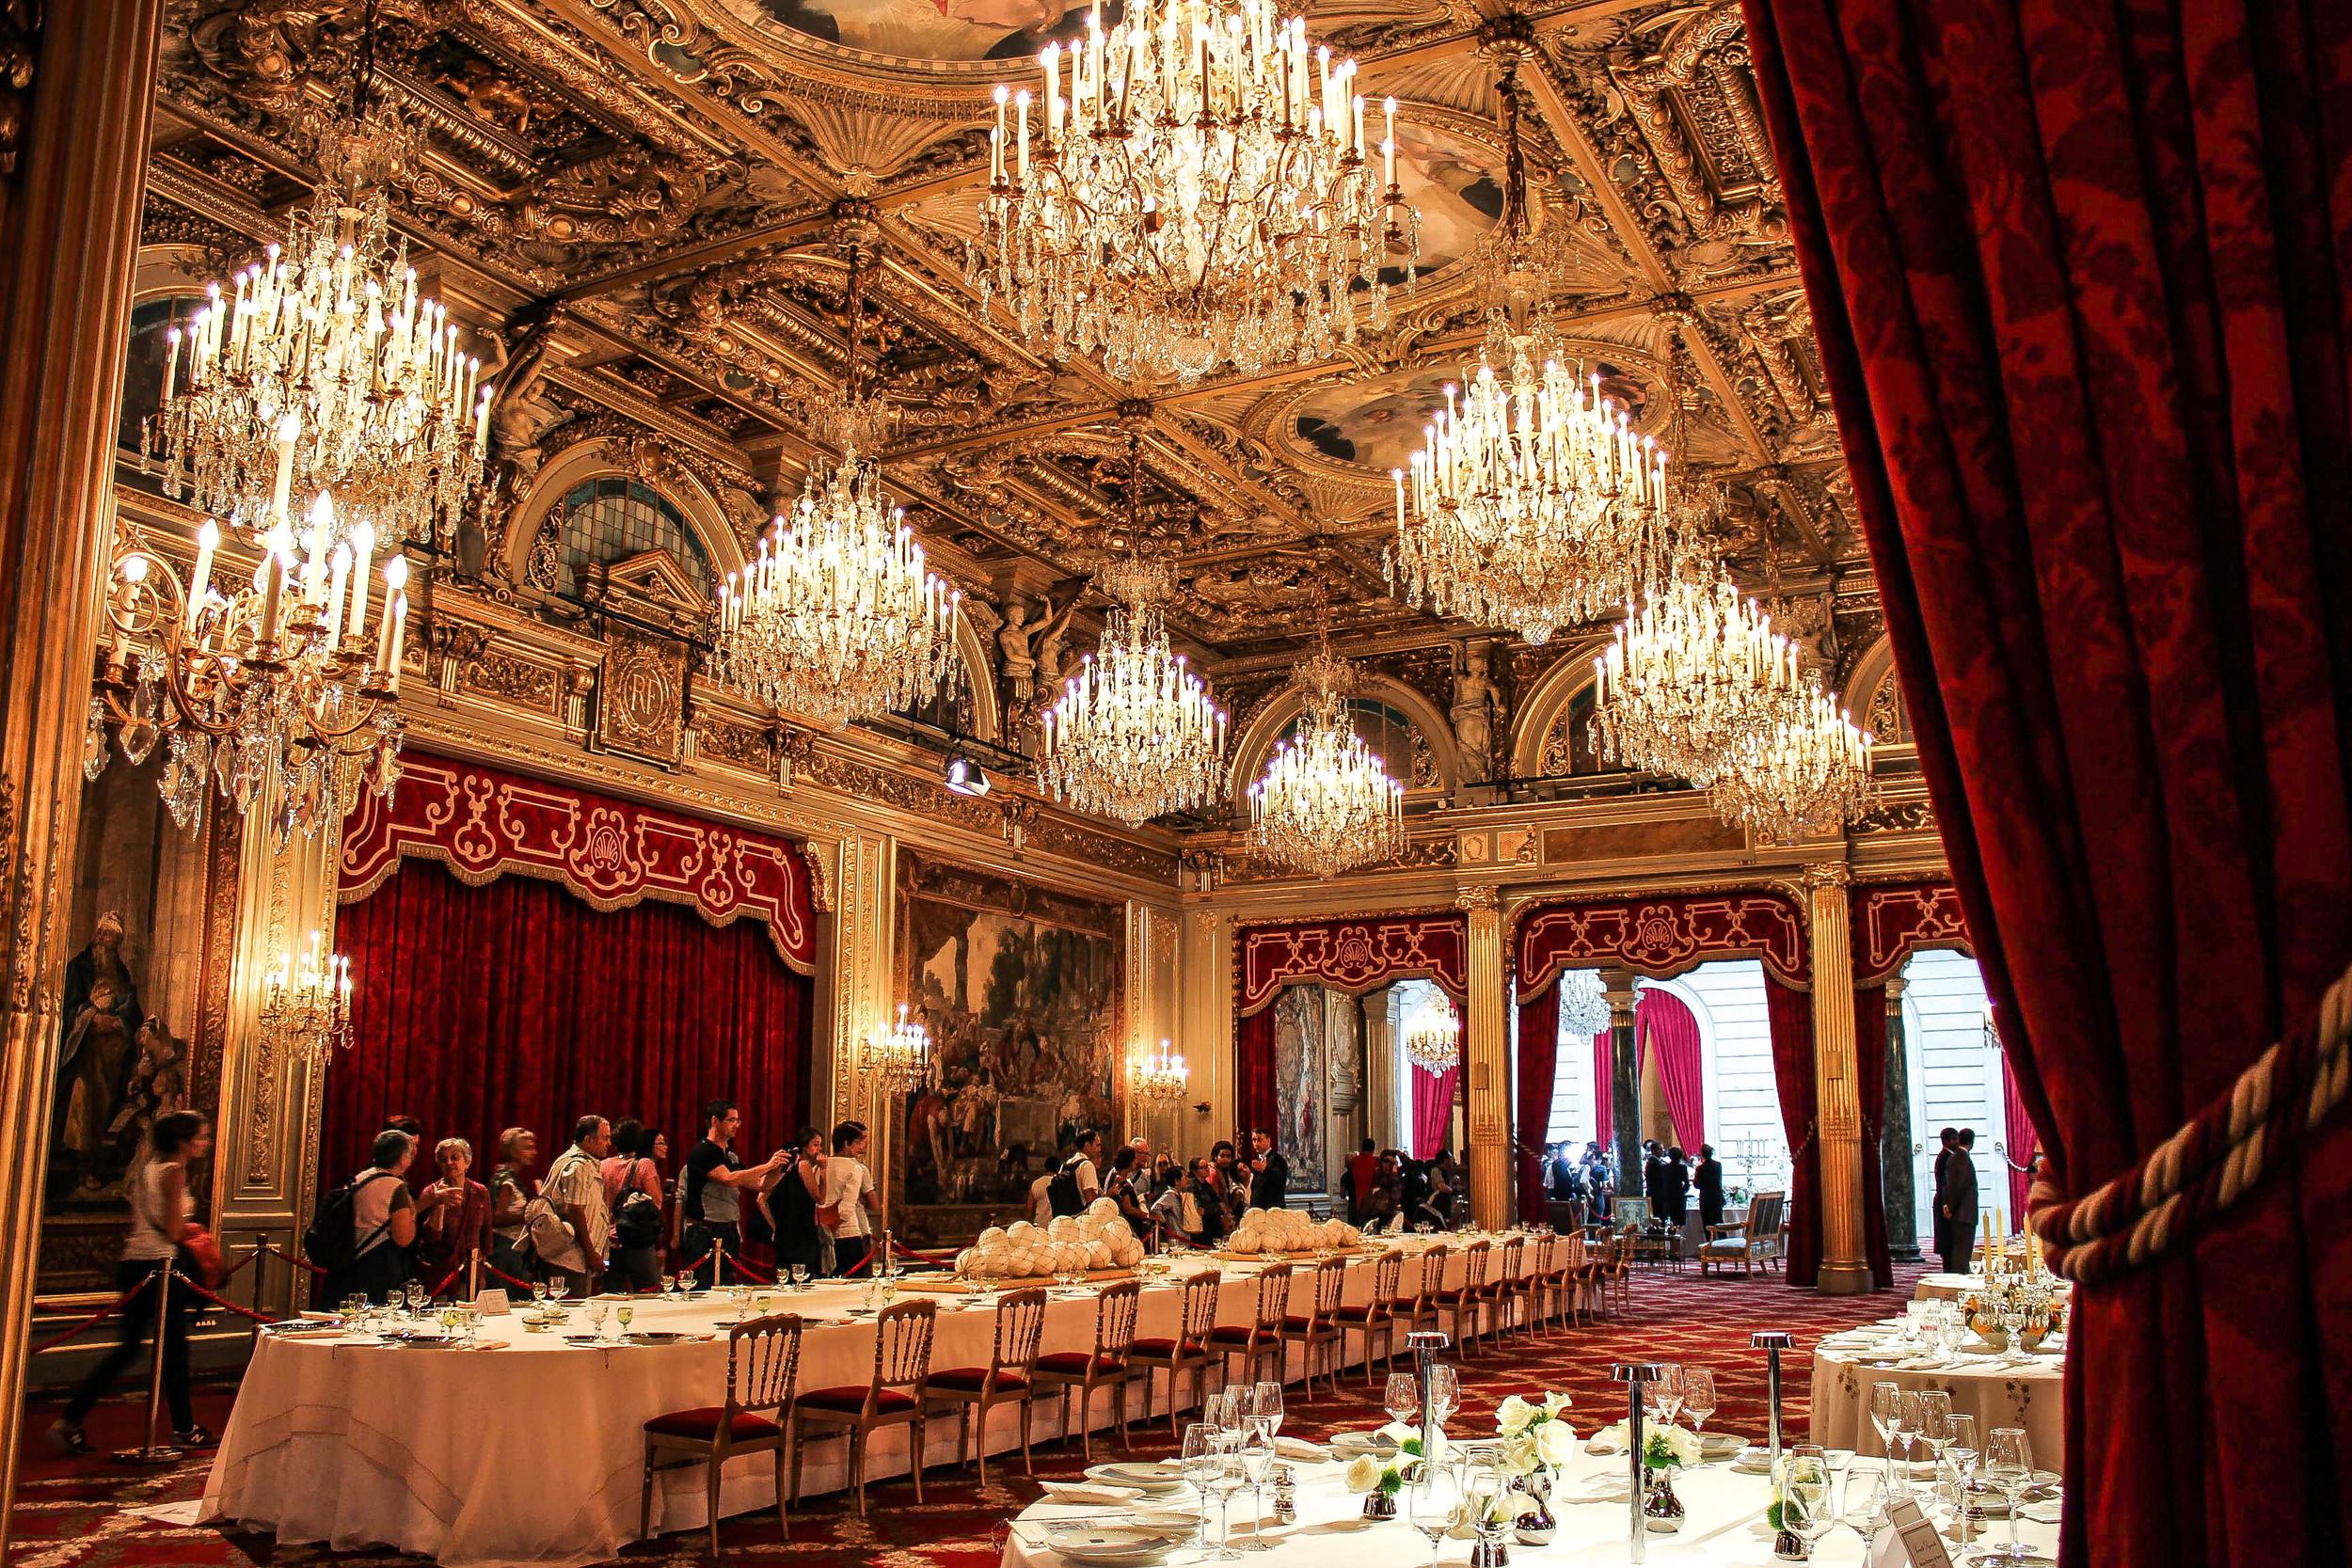 Salle des Fêtes. Ideal setting for official ceremonies.